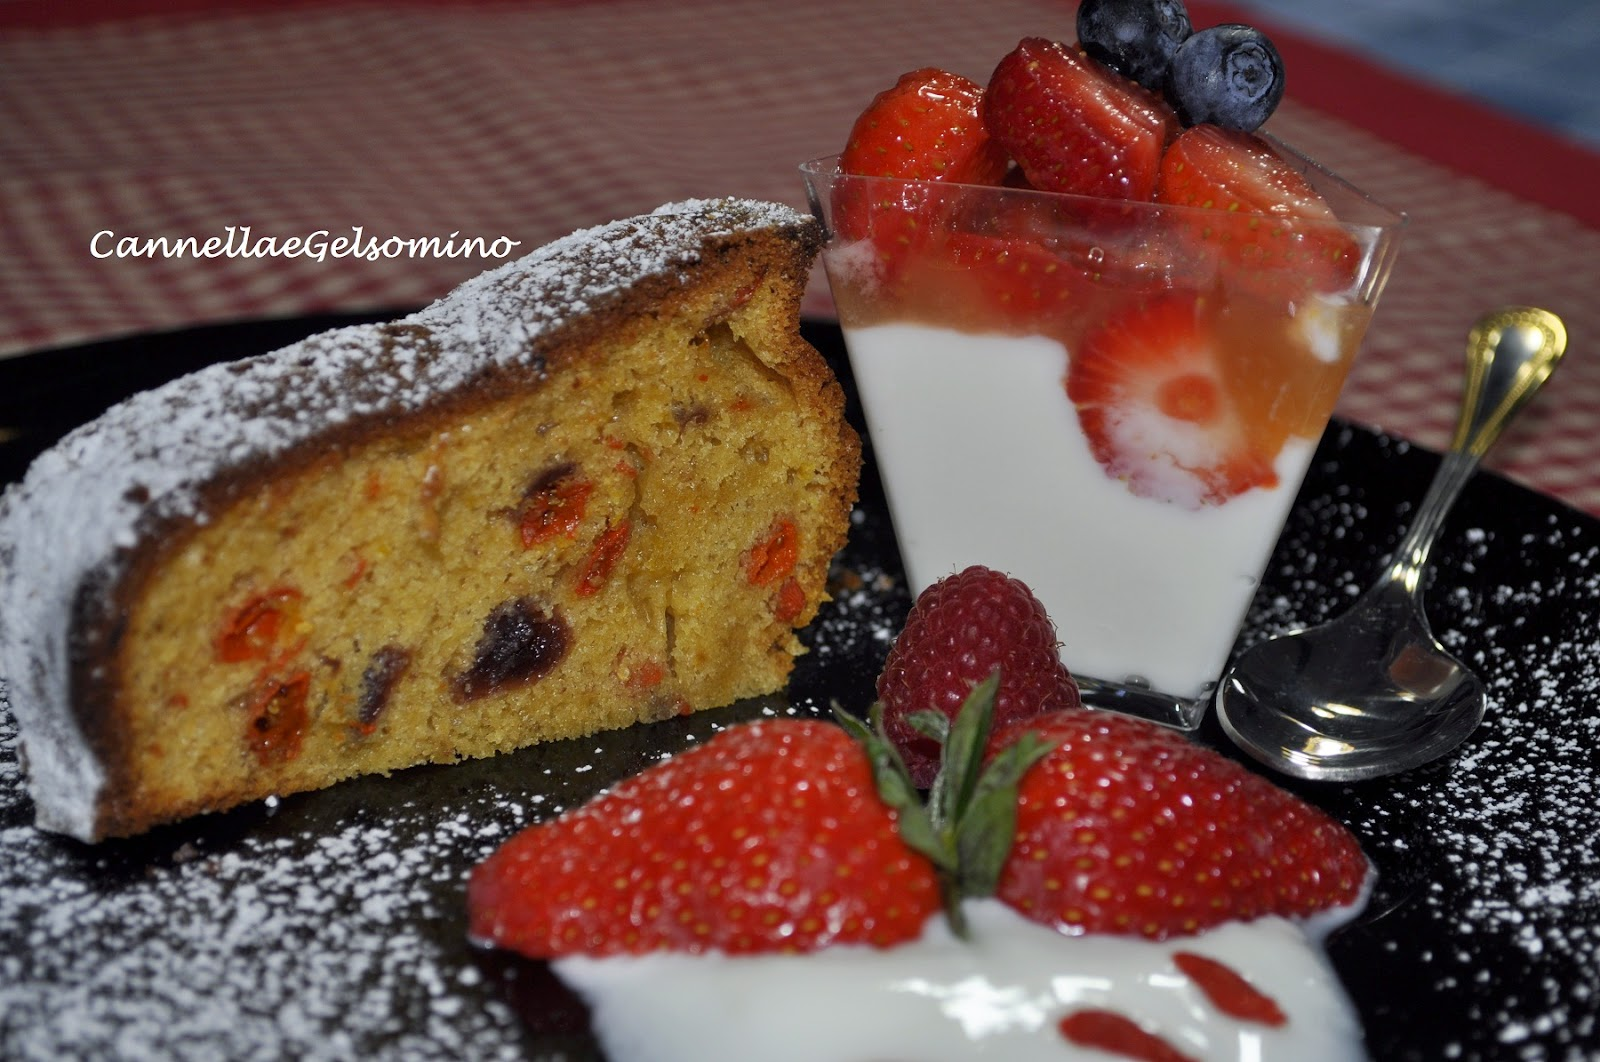 torta alle bacche di goji e frutti rossi